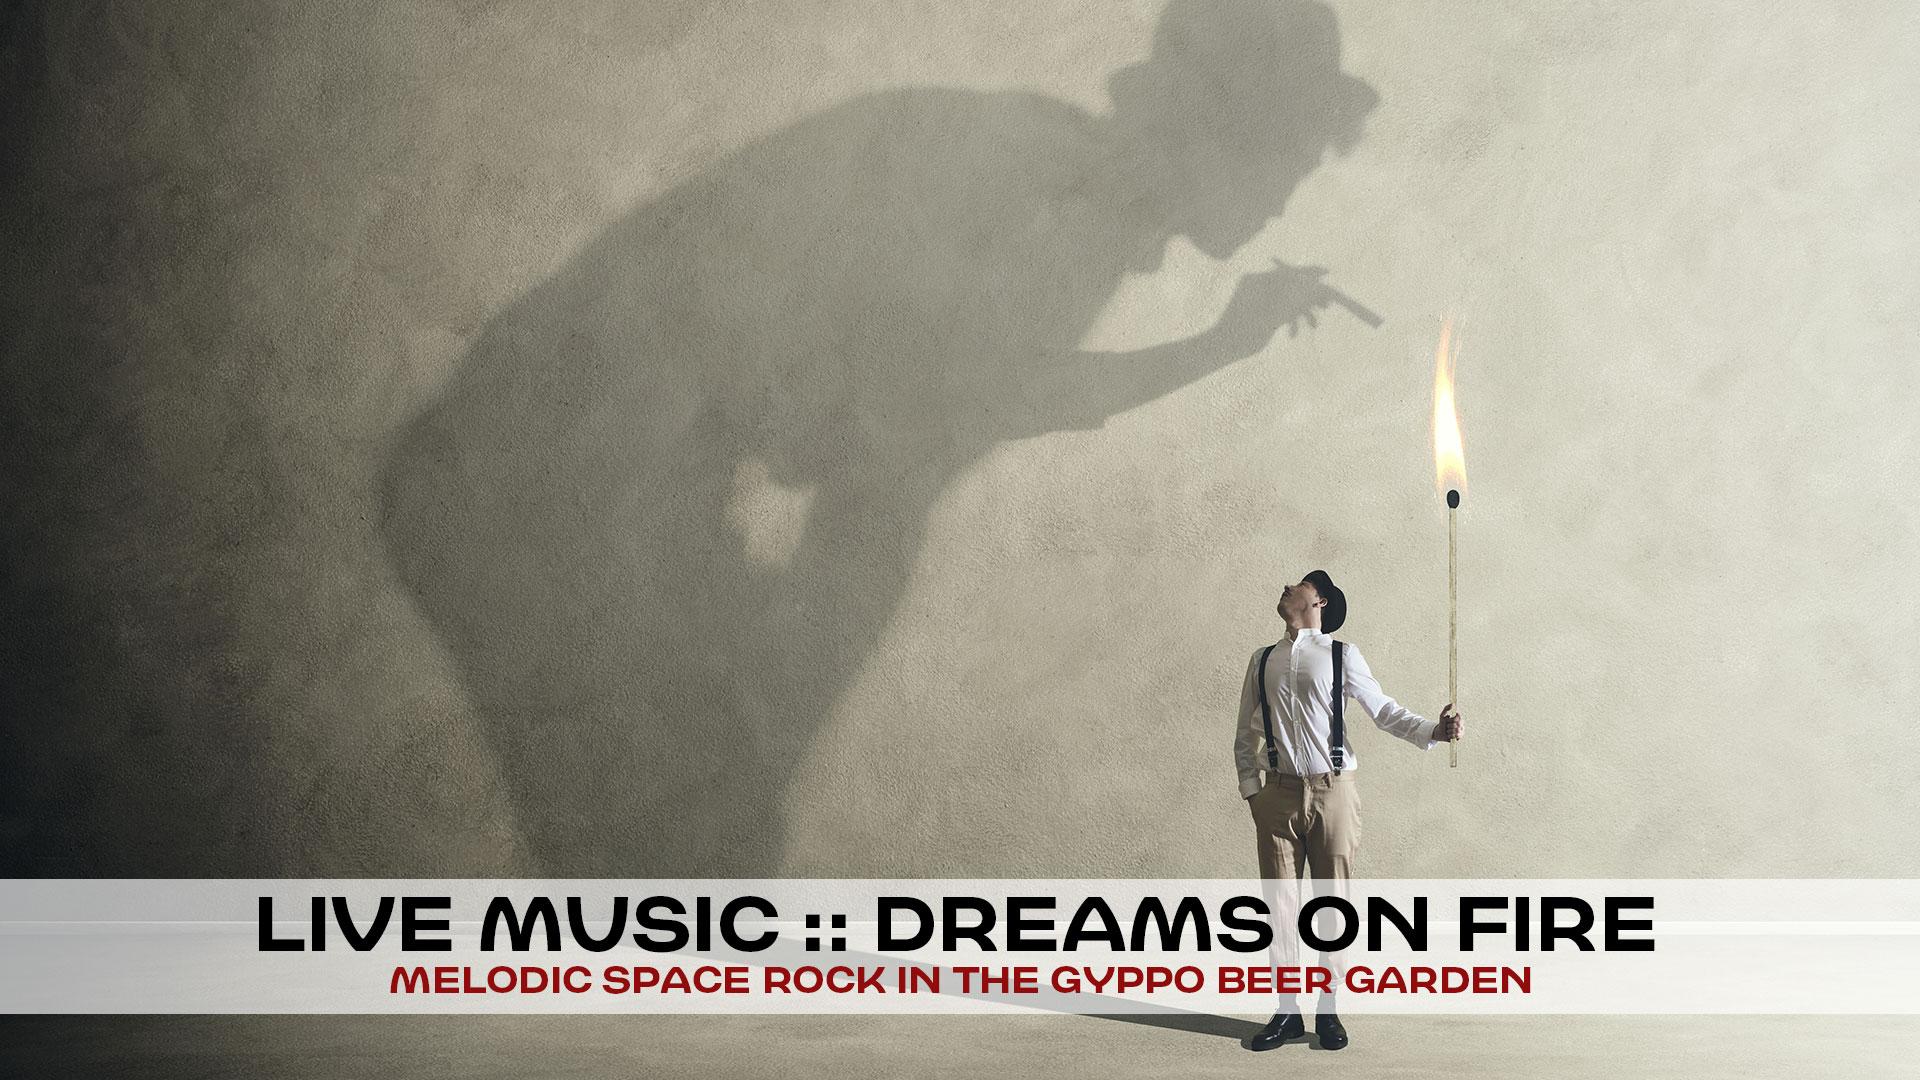 lm-dreams-on-fire.jpg